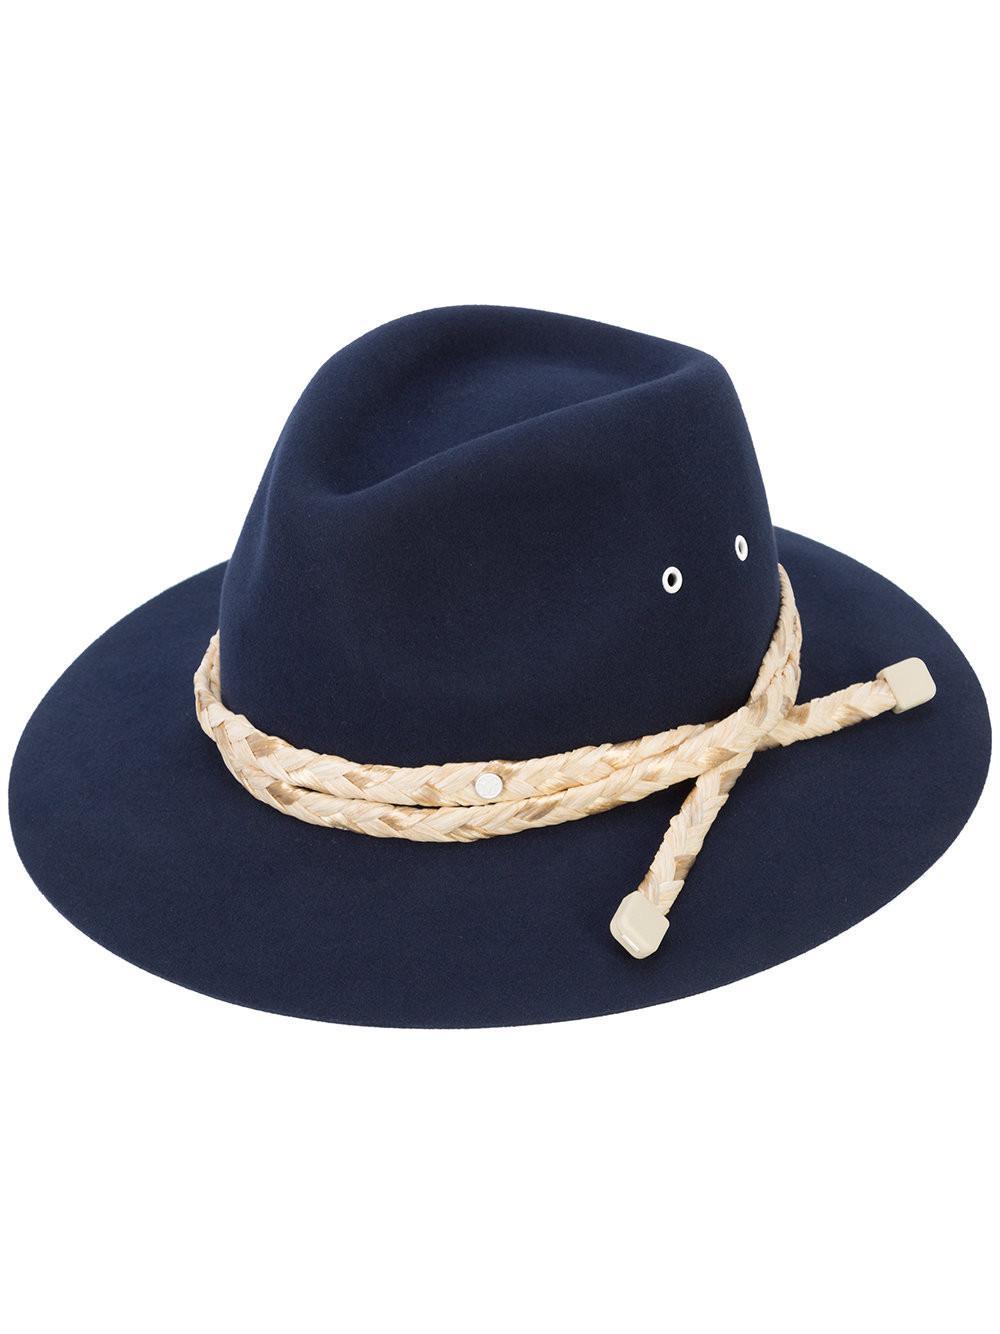 584ffde1fe3 Maison Michel Rico Fedora Hat in Blue for Men - Save ...